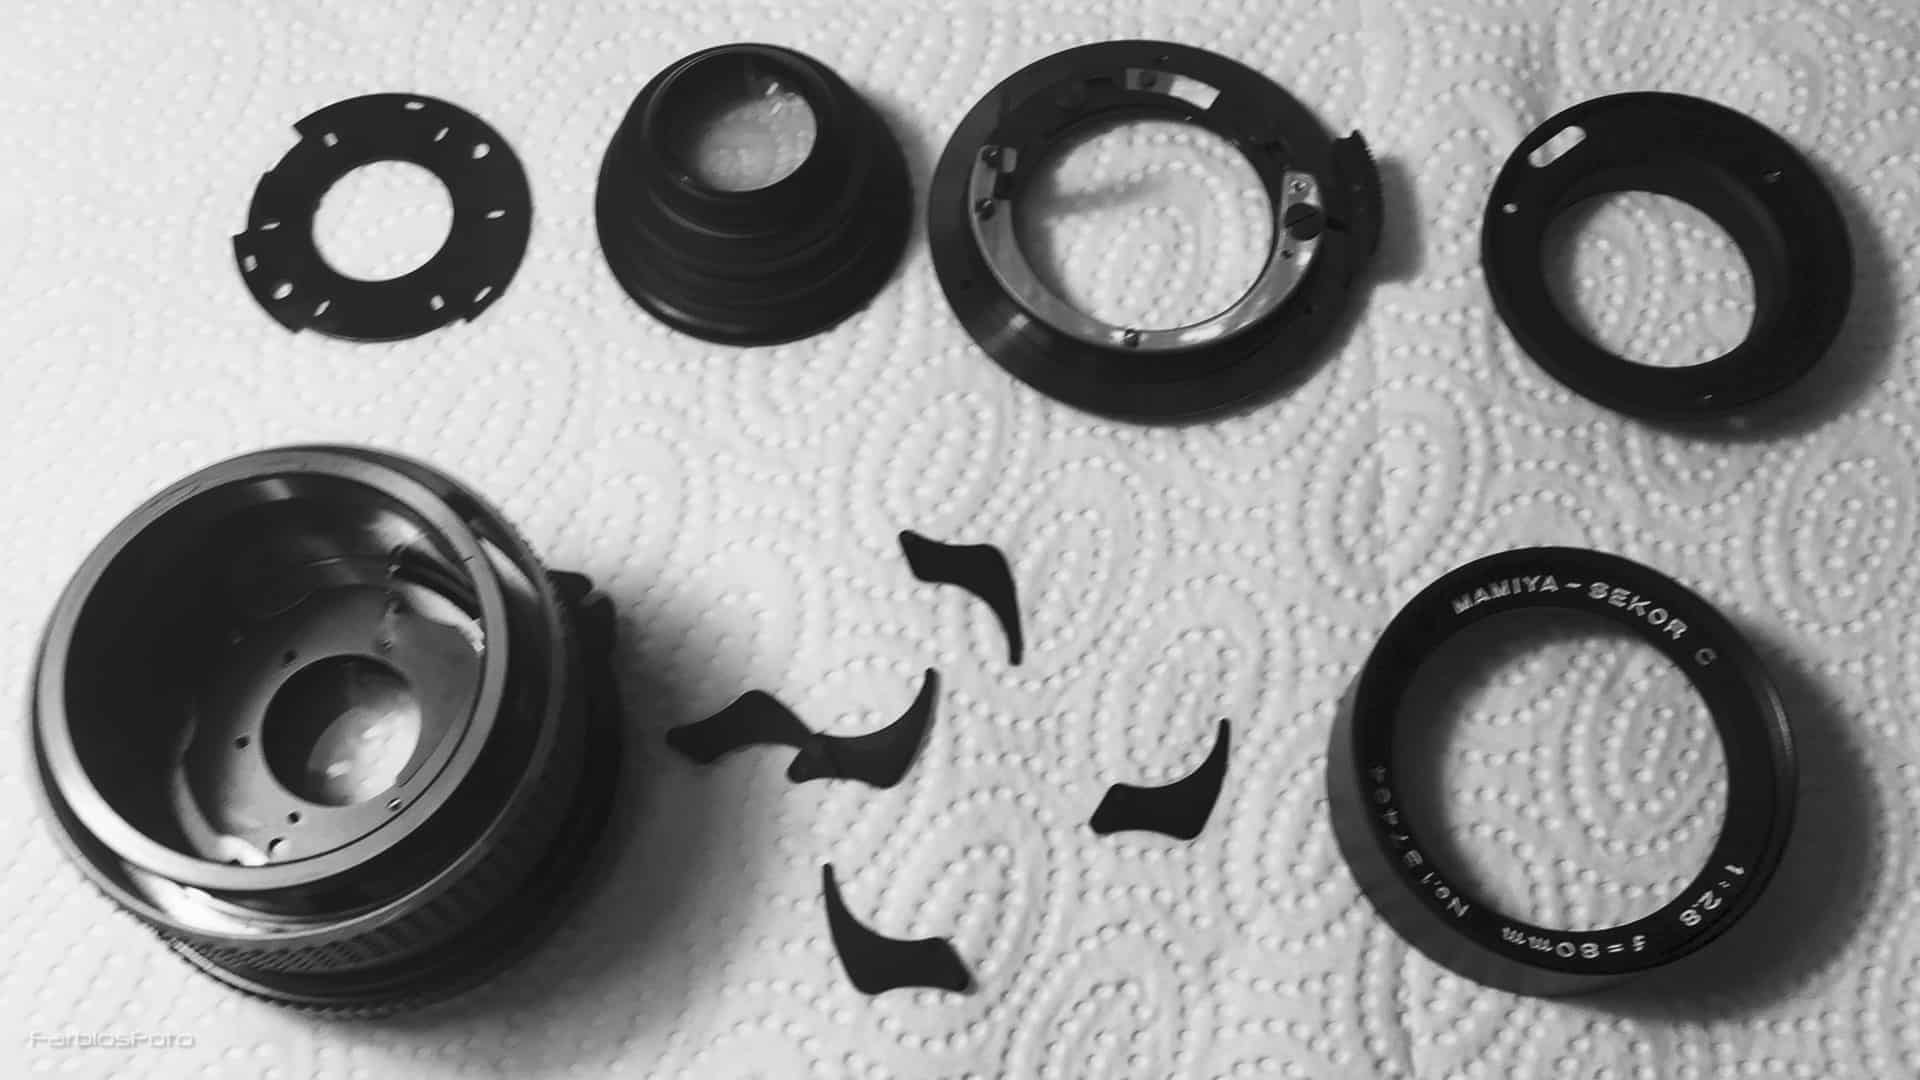 Einzelteile Mamiya Sektor C 80mm f2.8